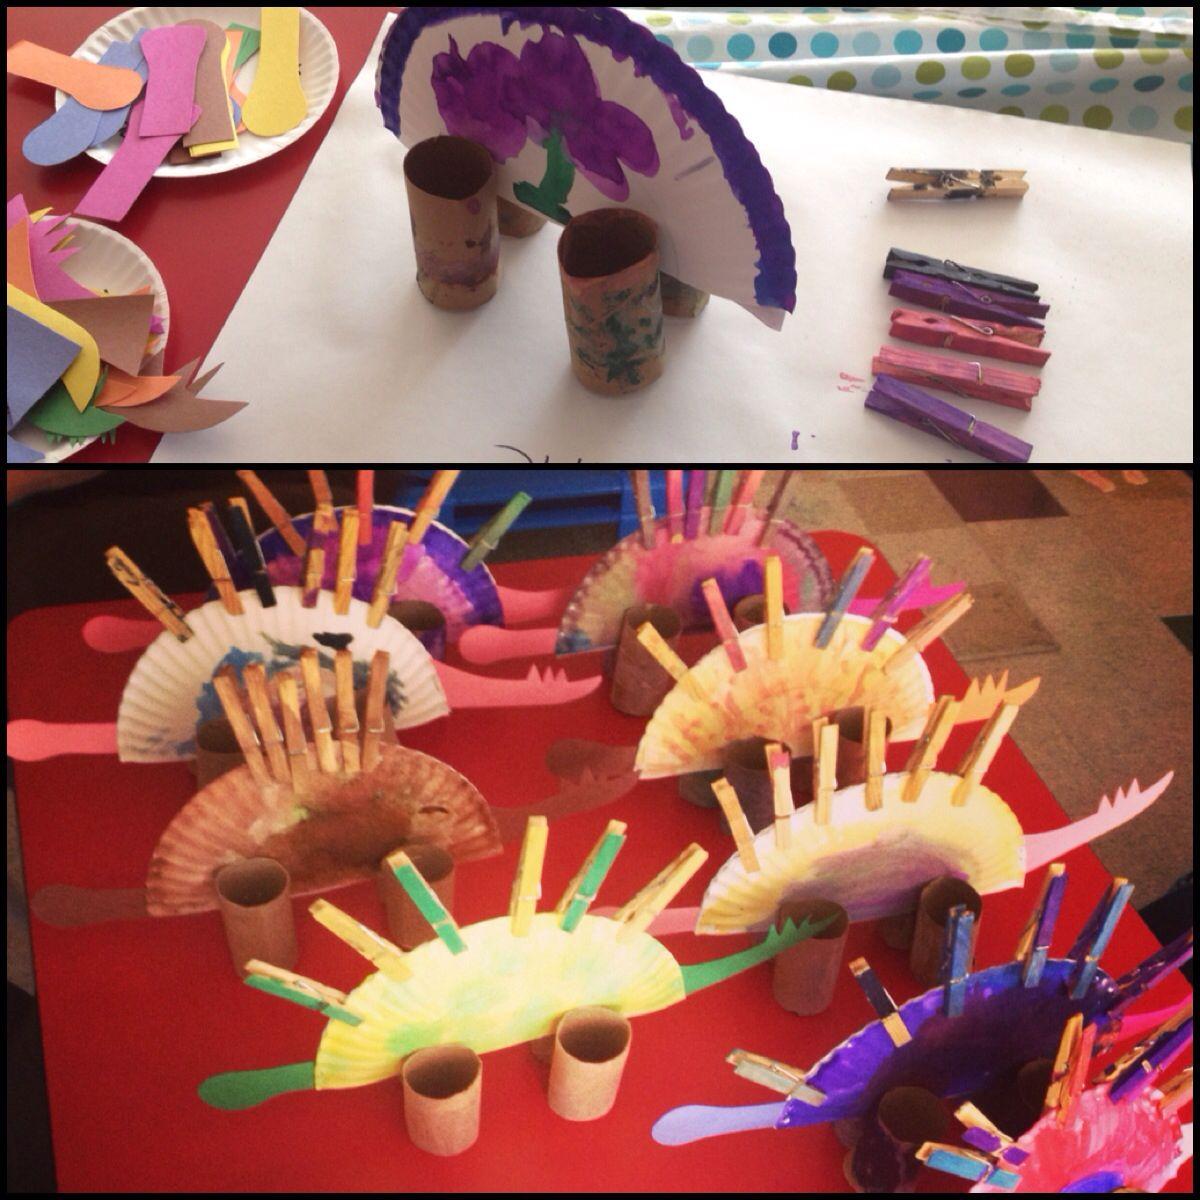 stegosaurus dinosaur craft for kids children 39 s crafts dinosaur crafts dino craft. Black Bedroom Furniture Sets. Home Design Ideas